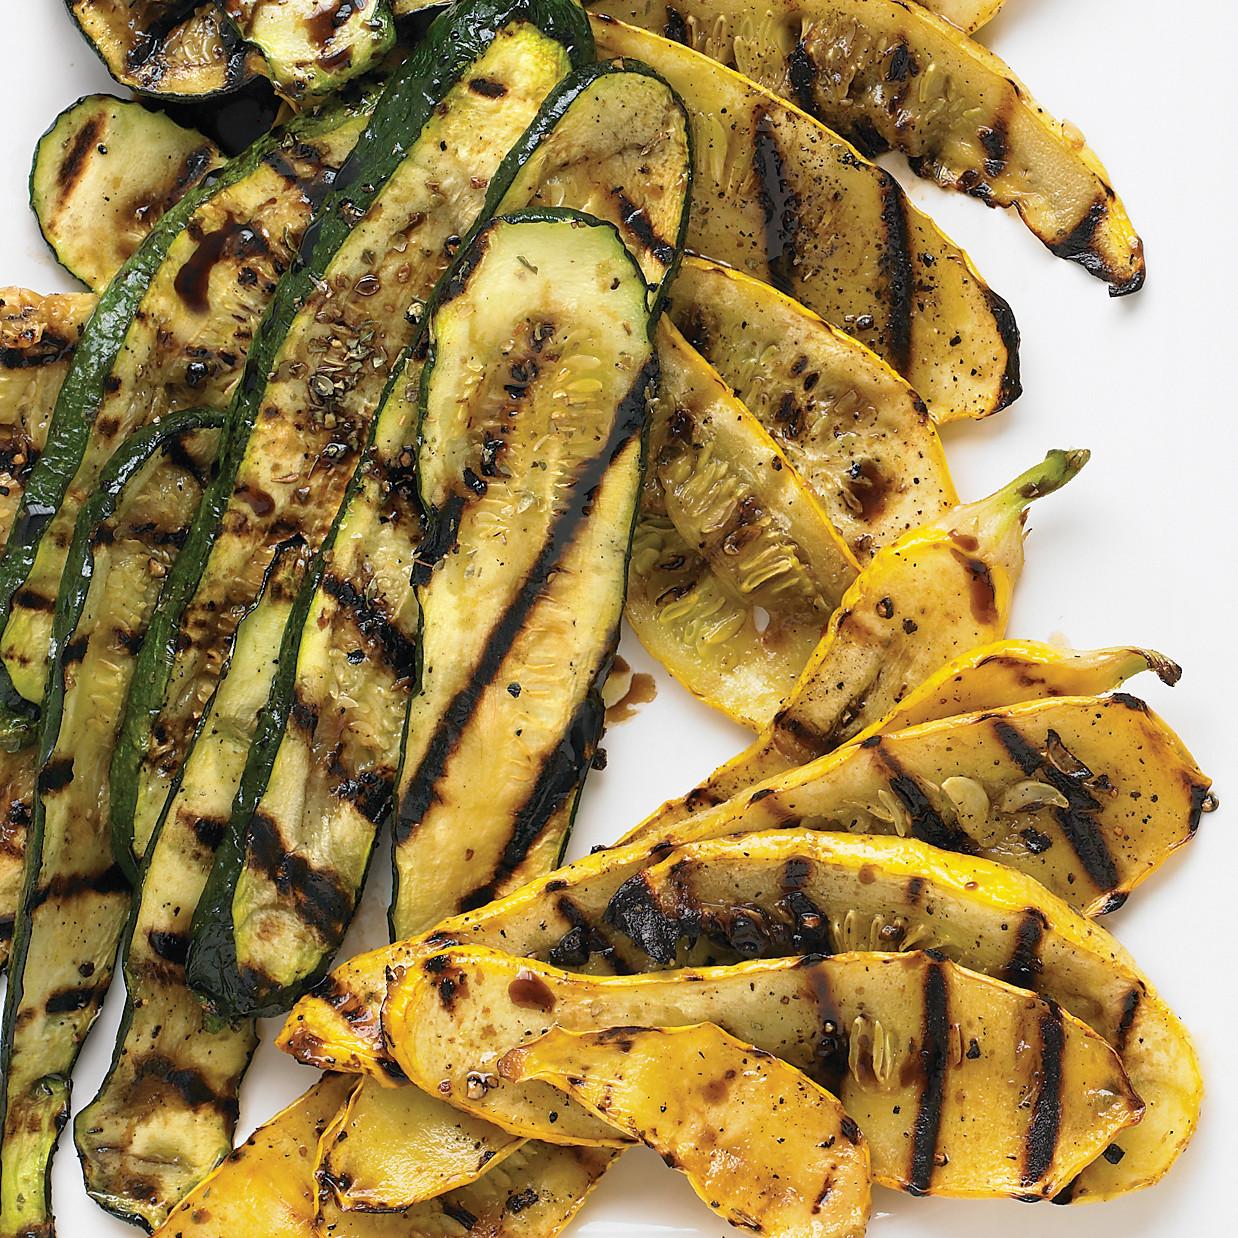 Grilled Summer Squash  Grilled Zucchini Summer Squash Recipe — Dishmaps